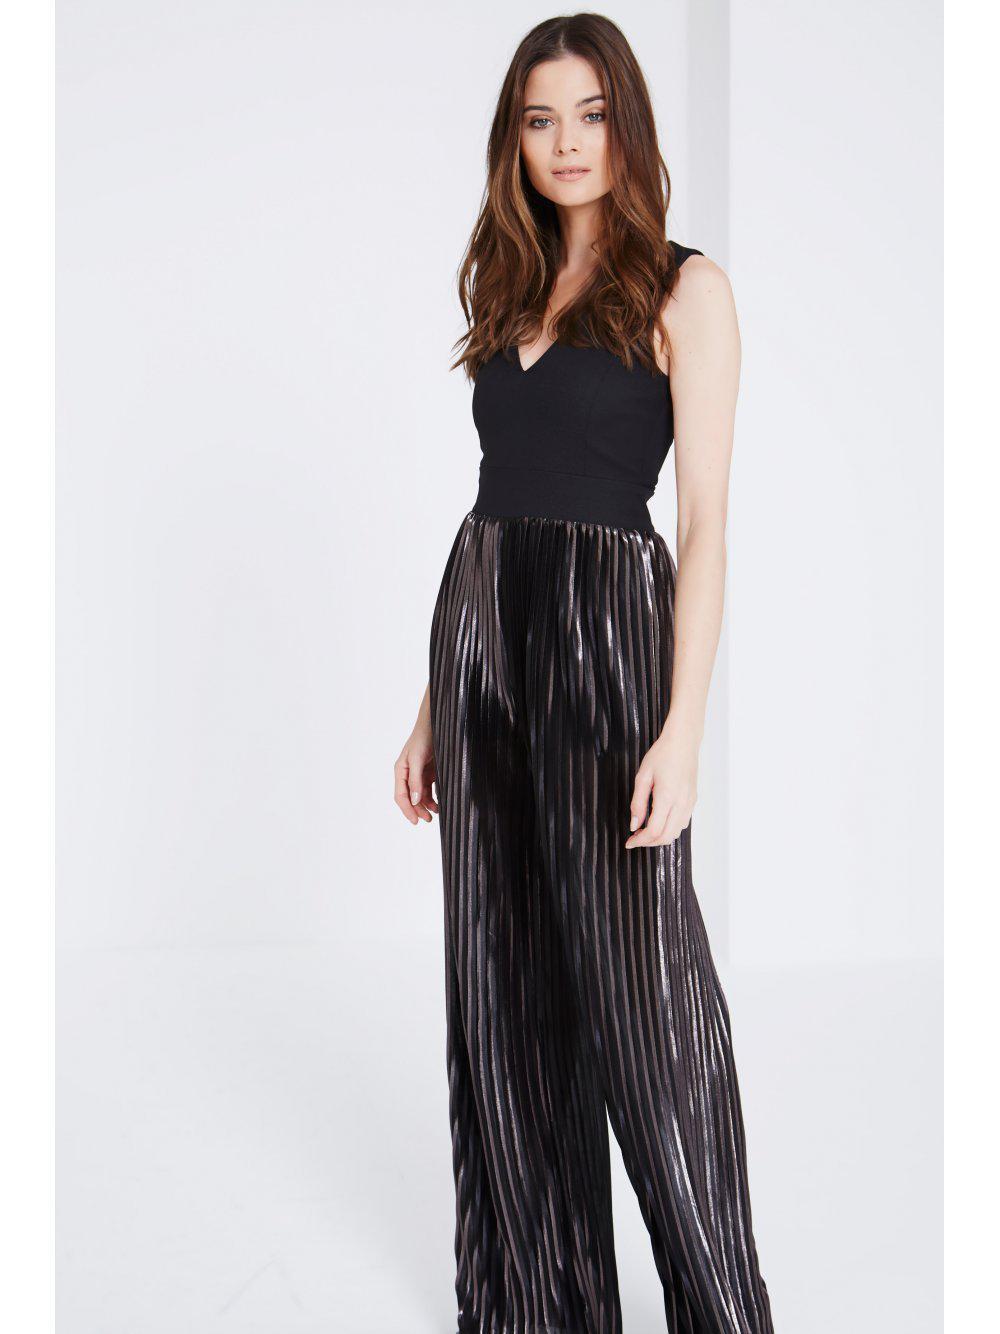 8567cd59d90 Lyst - Lavish Alice Black Metallic Pleat Wide Leg Jumpsuit in Black